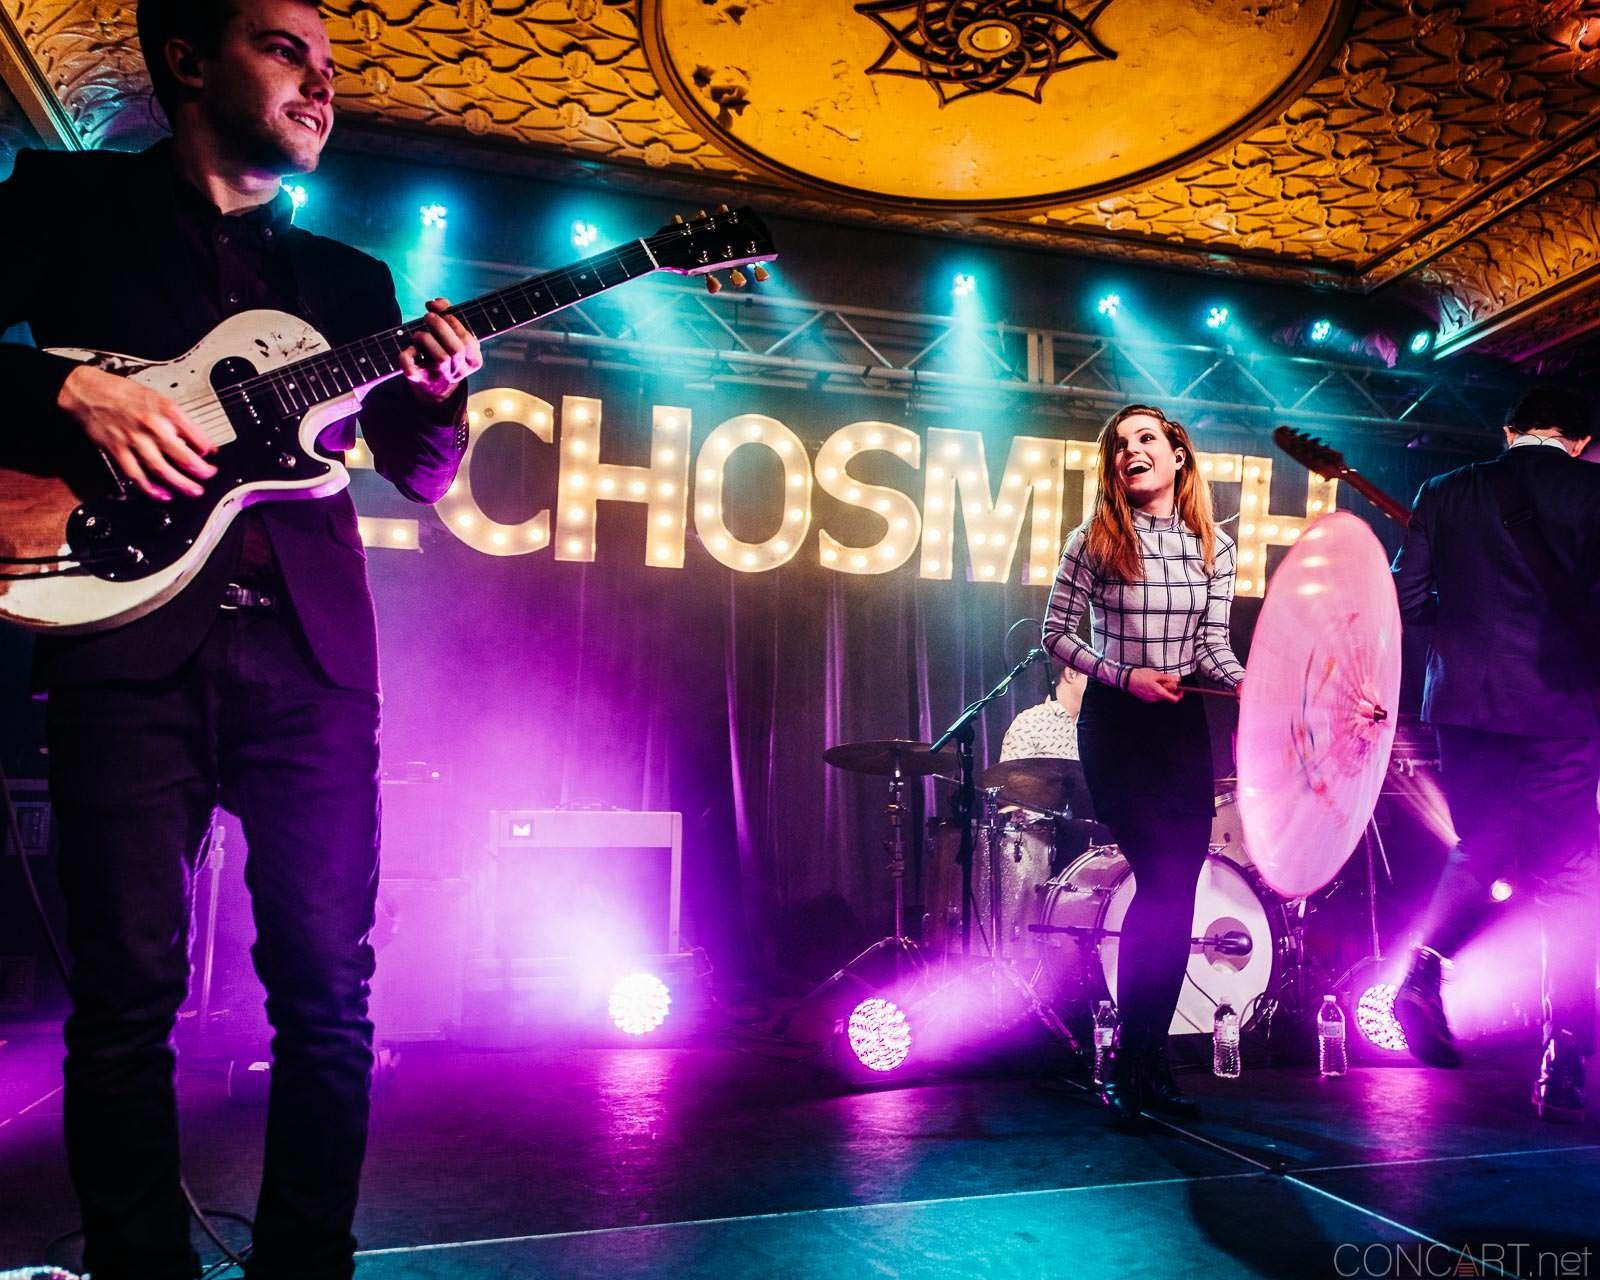 Echosmith photo by Sean Molin 51